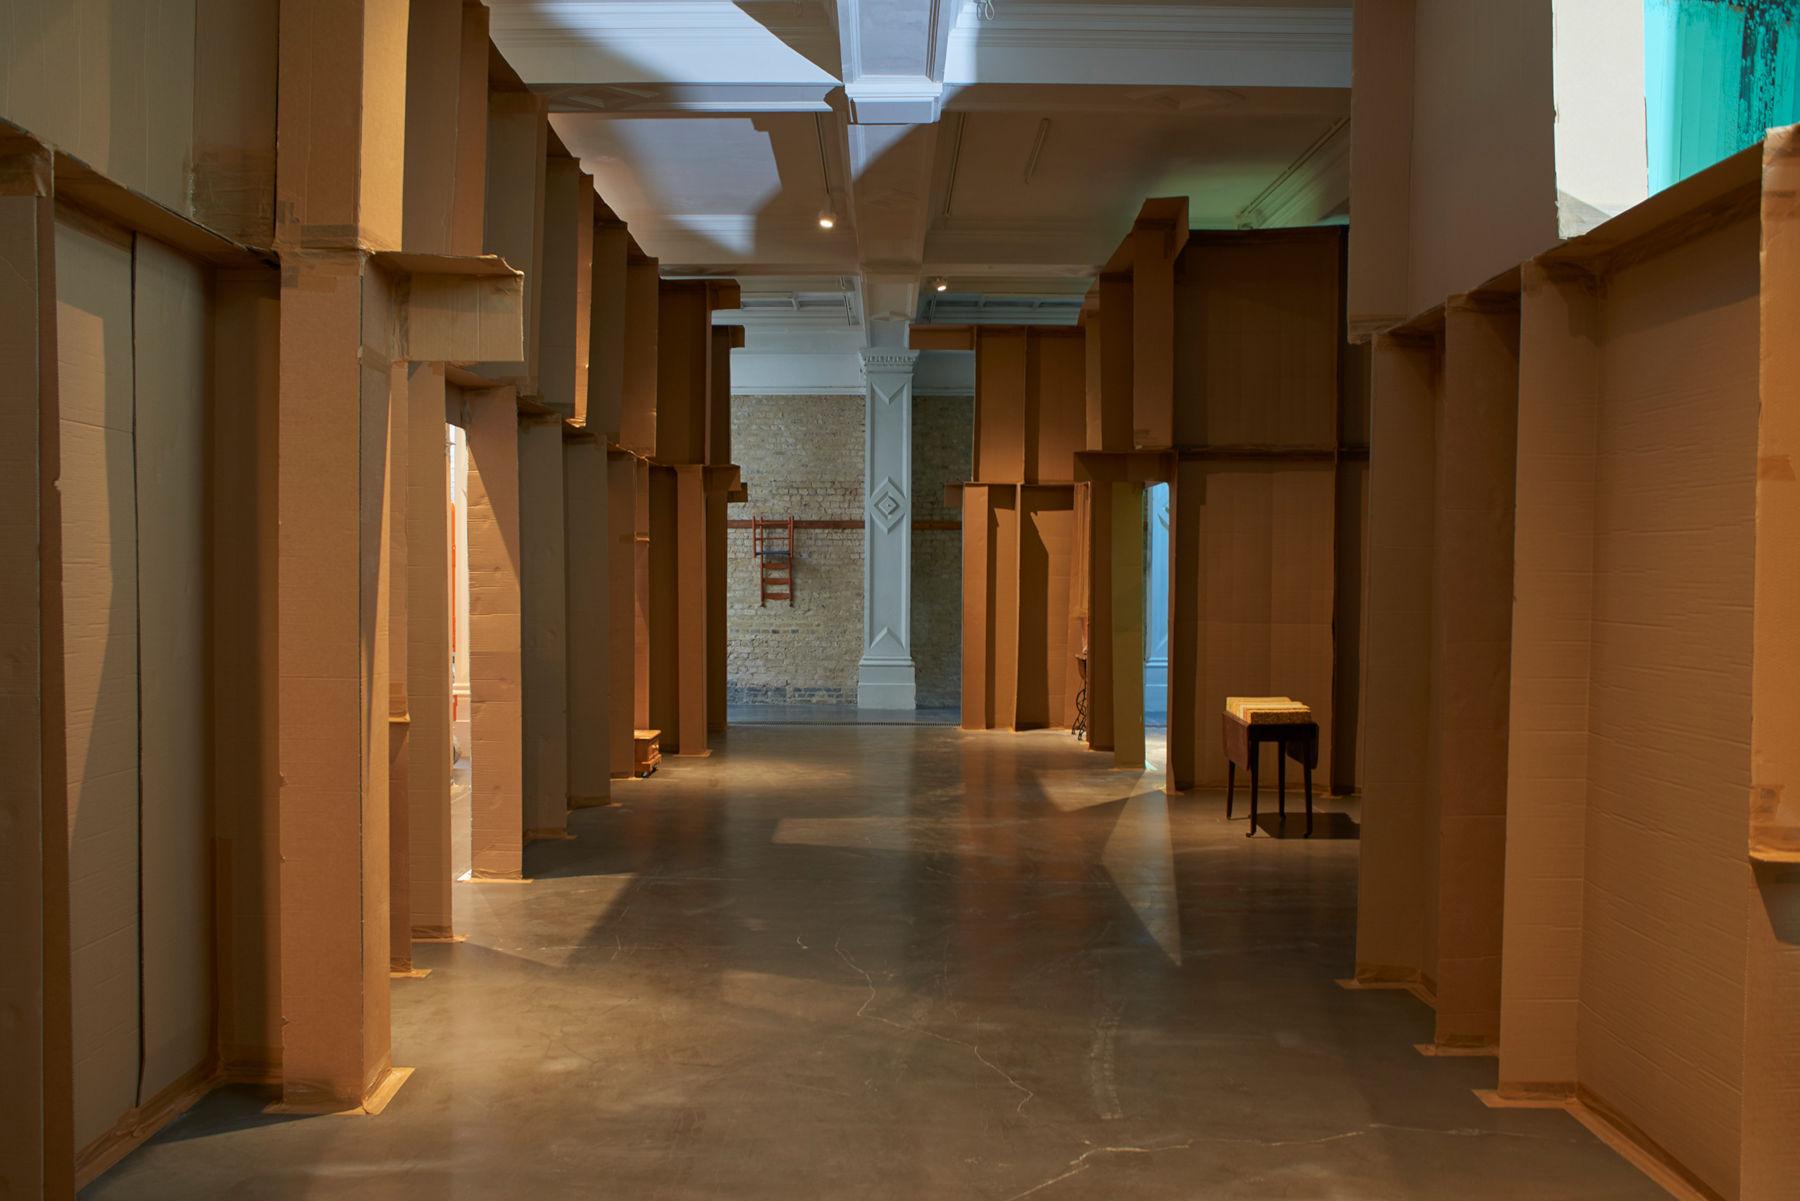 Whitechapel Gallery Carlos Bunga 1